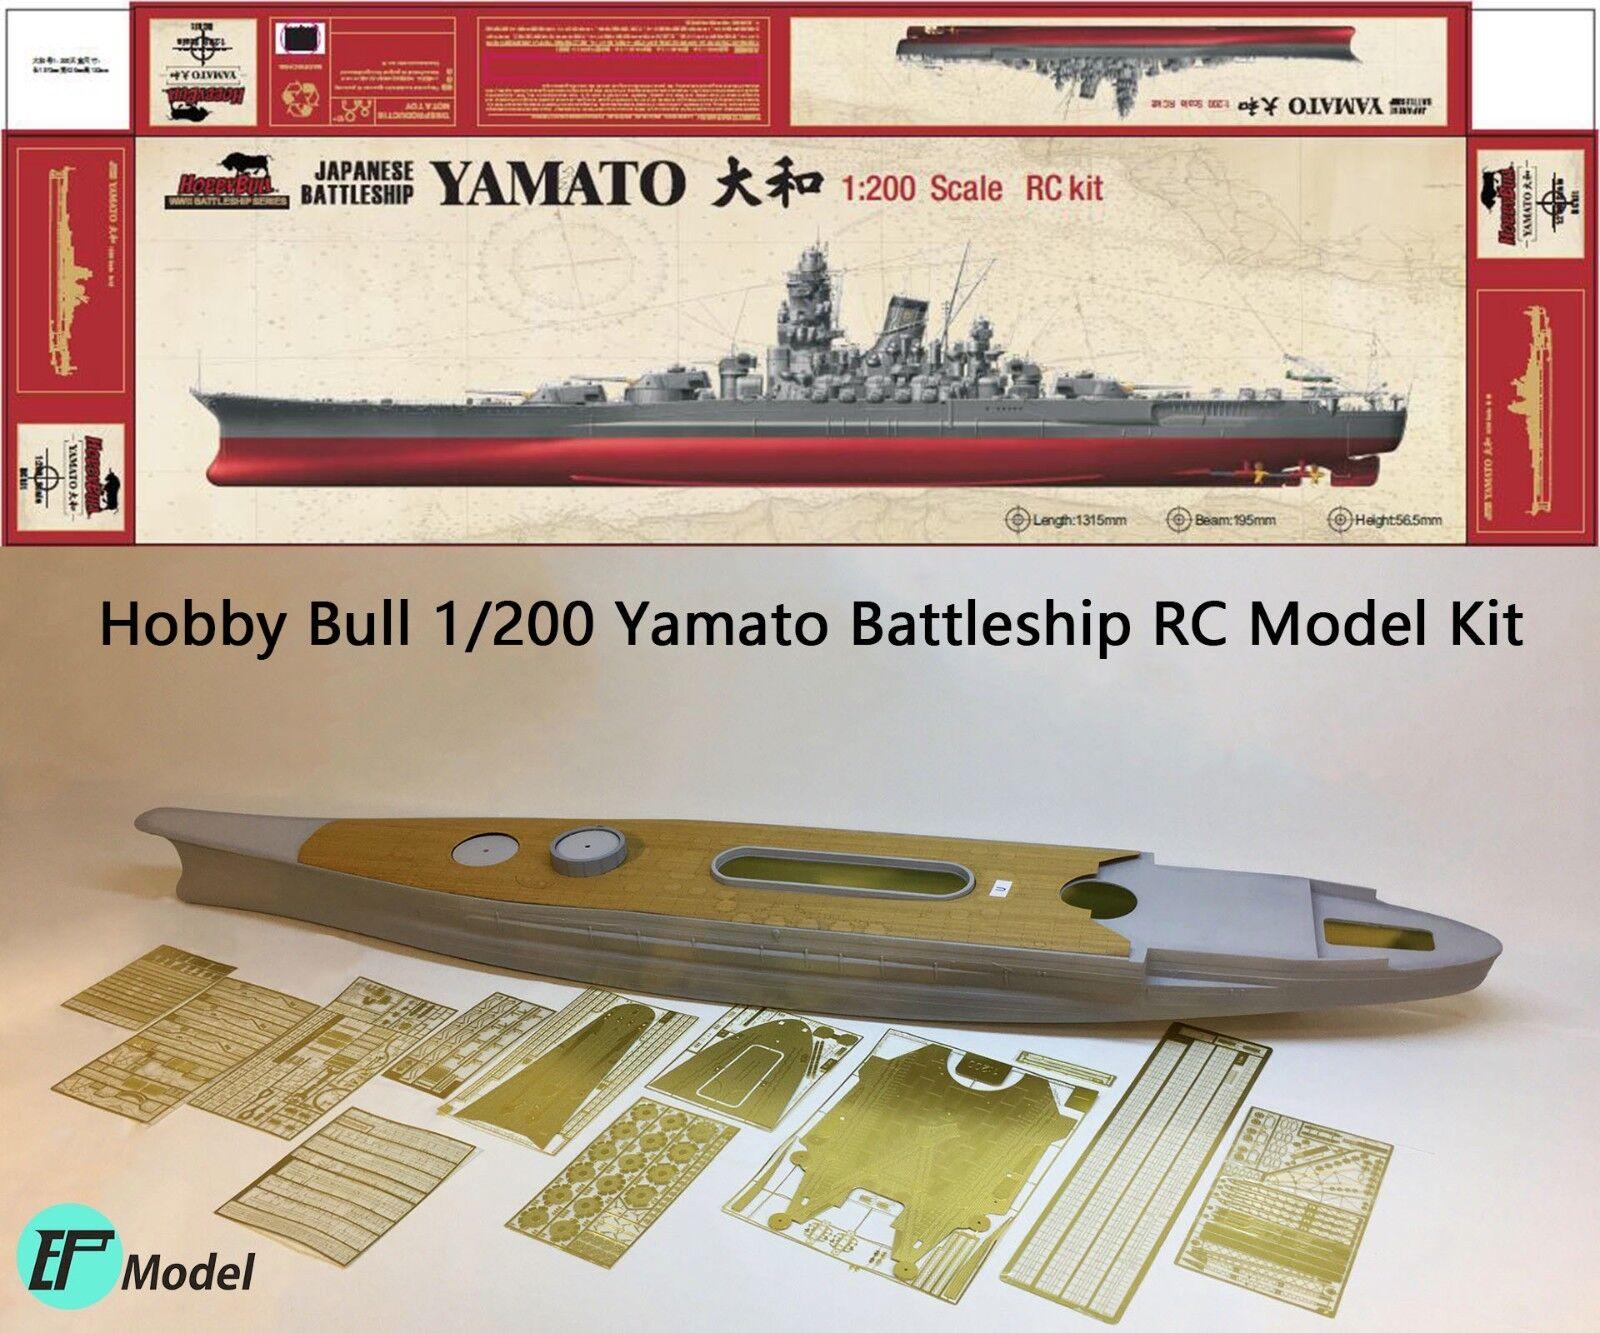 Hobby Bull 1/200 Yamato Battleship RC Kit